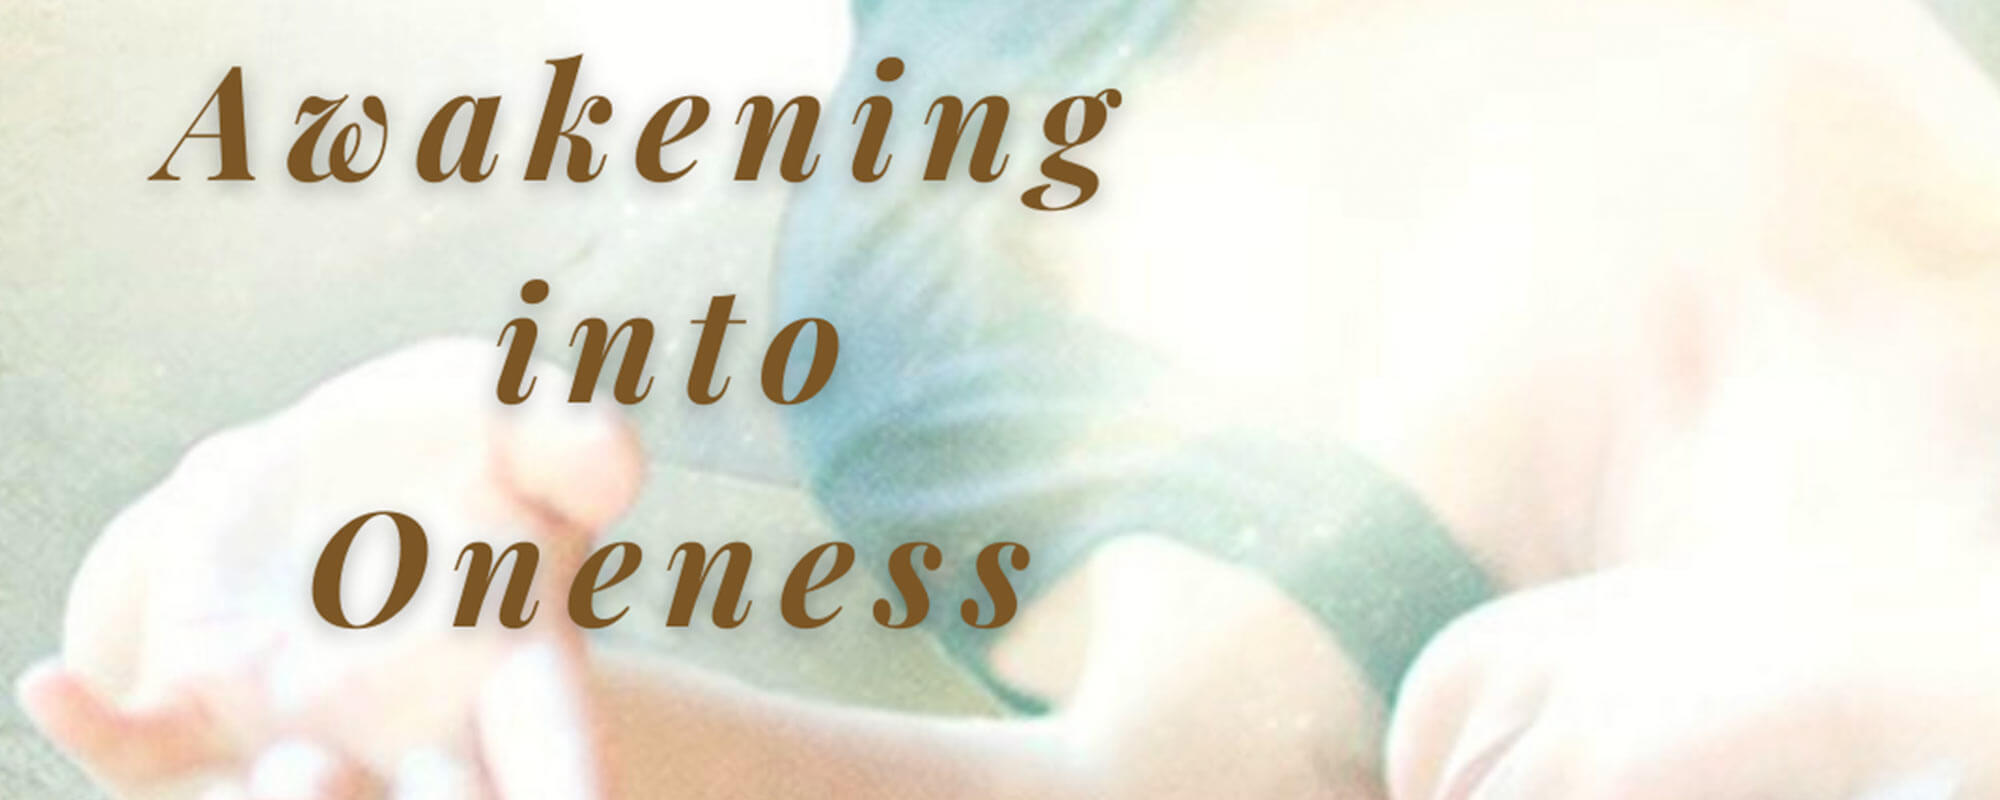 Awakening into Oneness, a Continuum Series